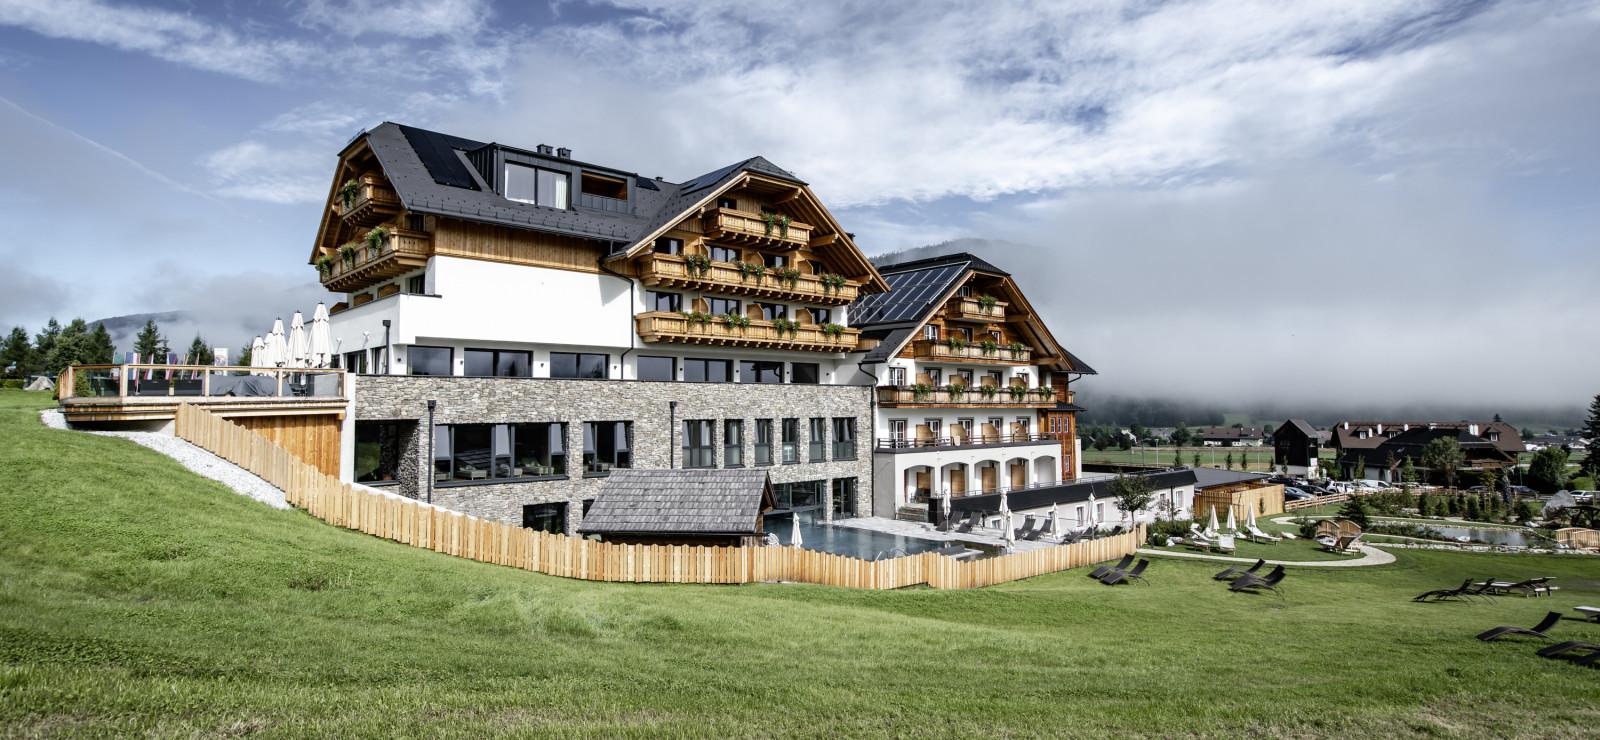 ALMGUT Mountain Wellness Hotel Bilder | Bild 1